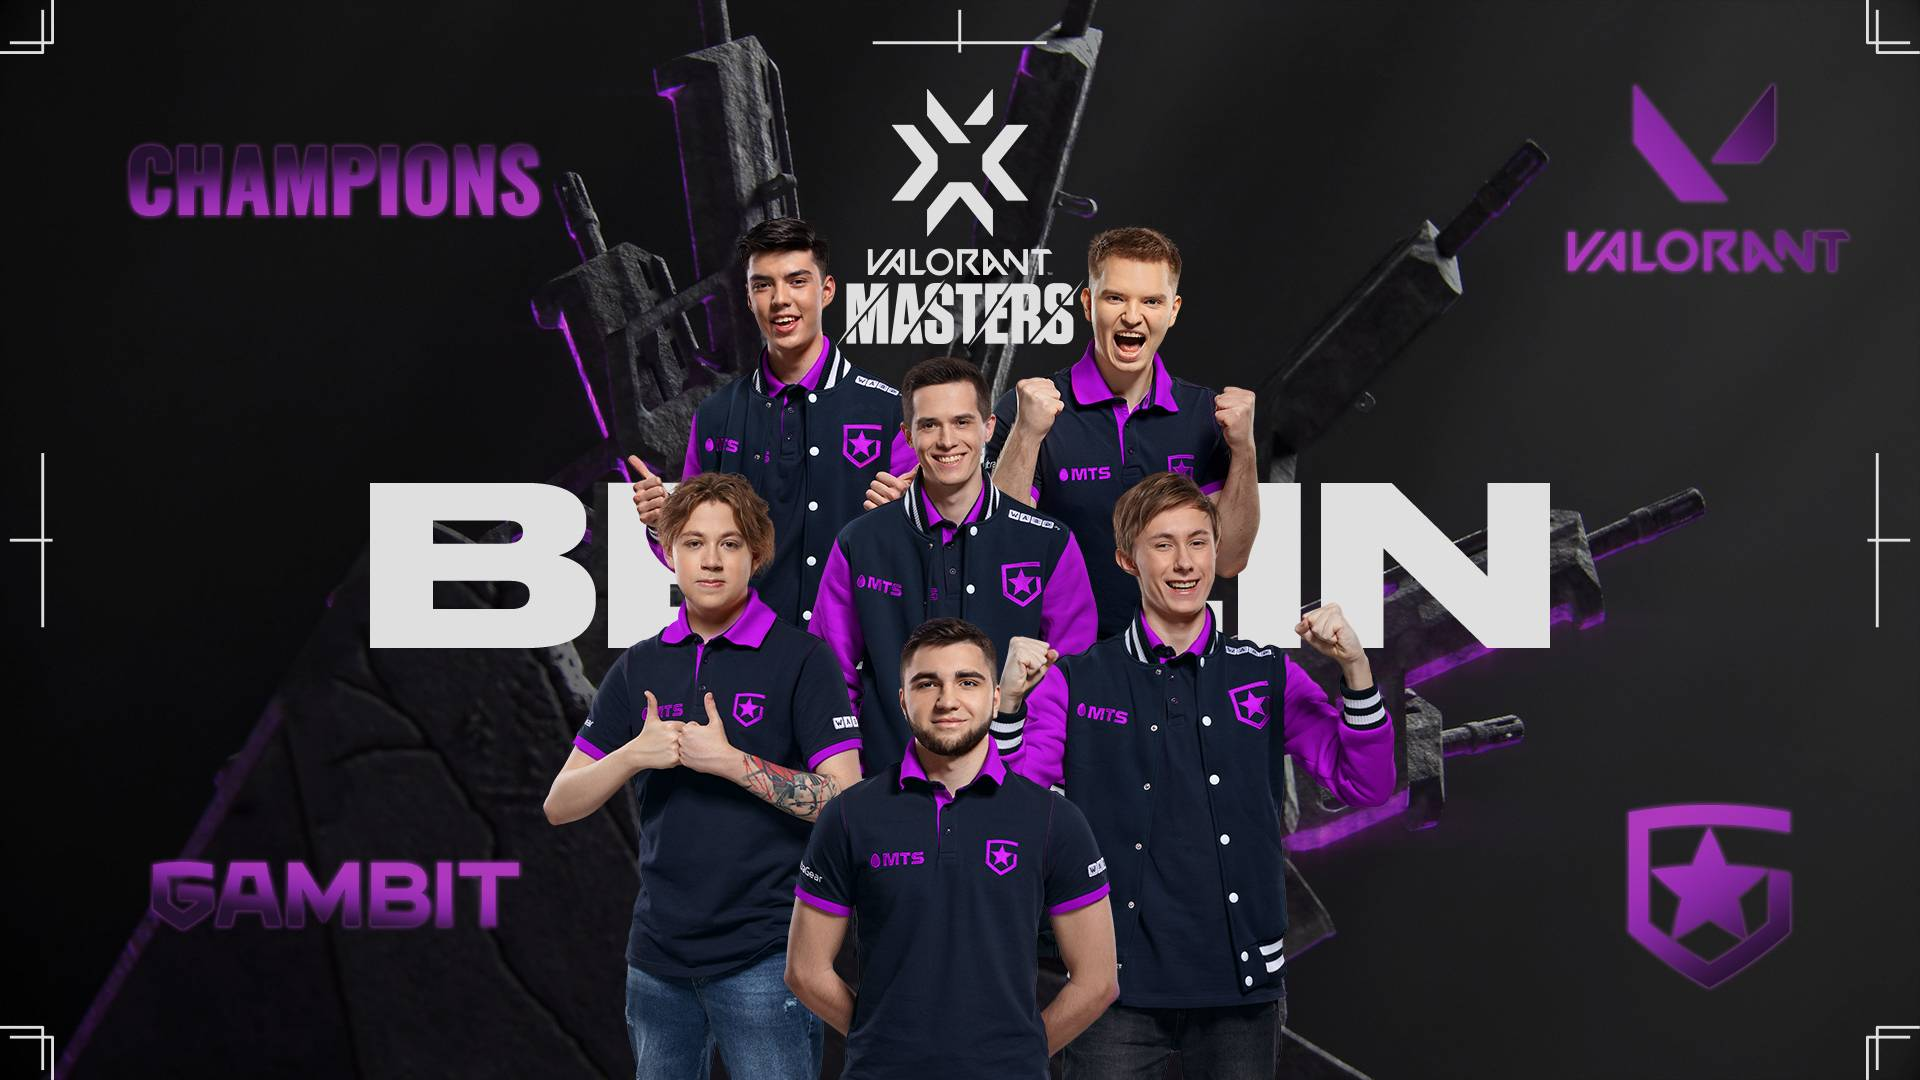 vct berlin champions gambit